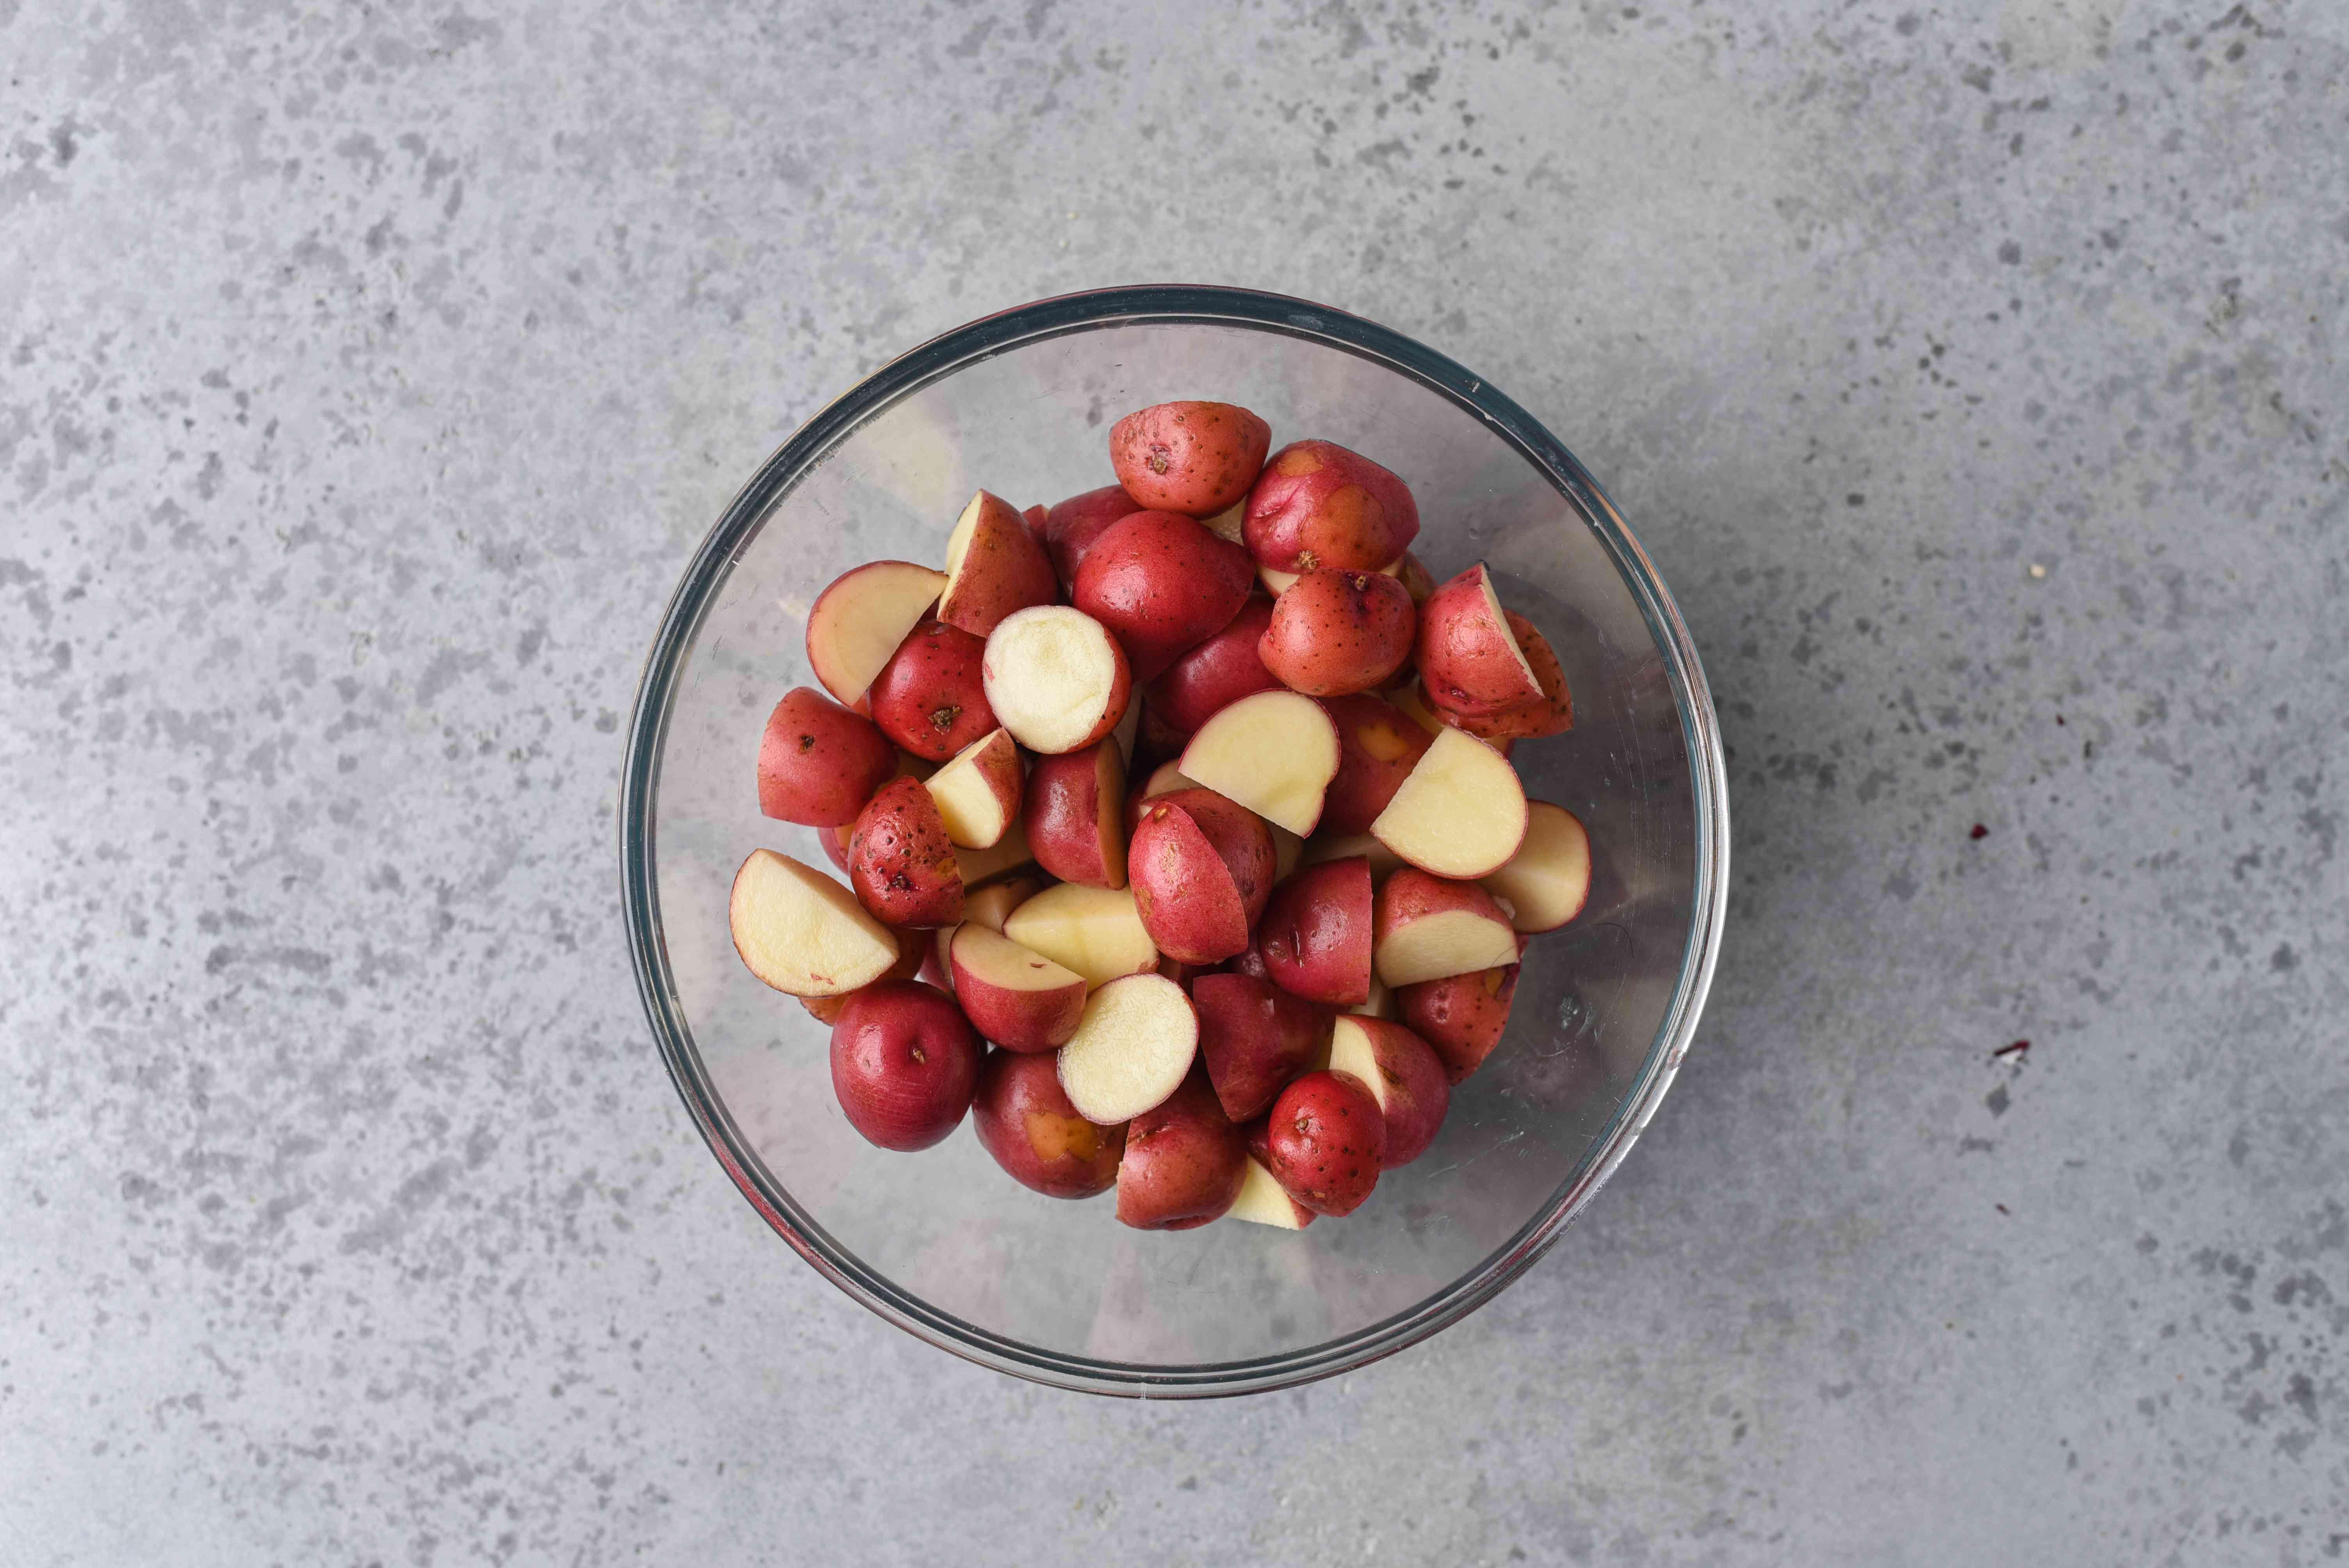 cut potatoes in a bowl